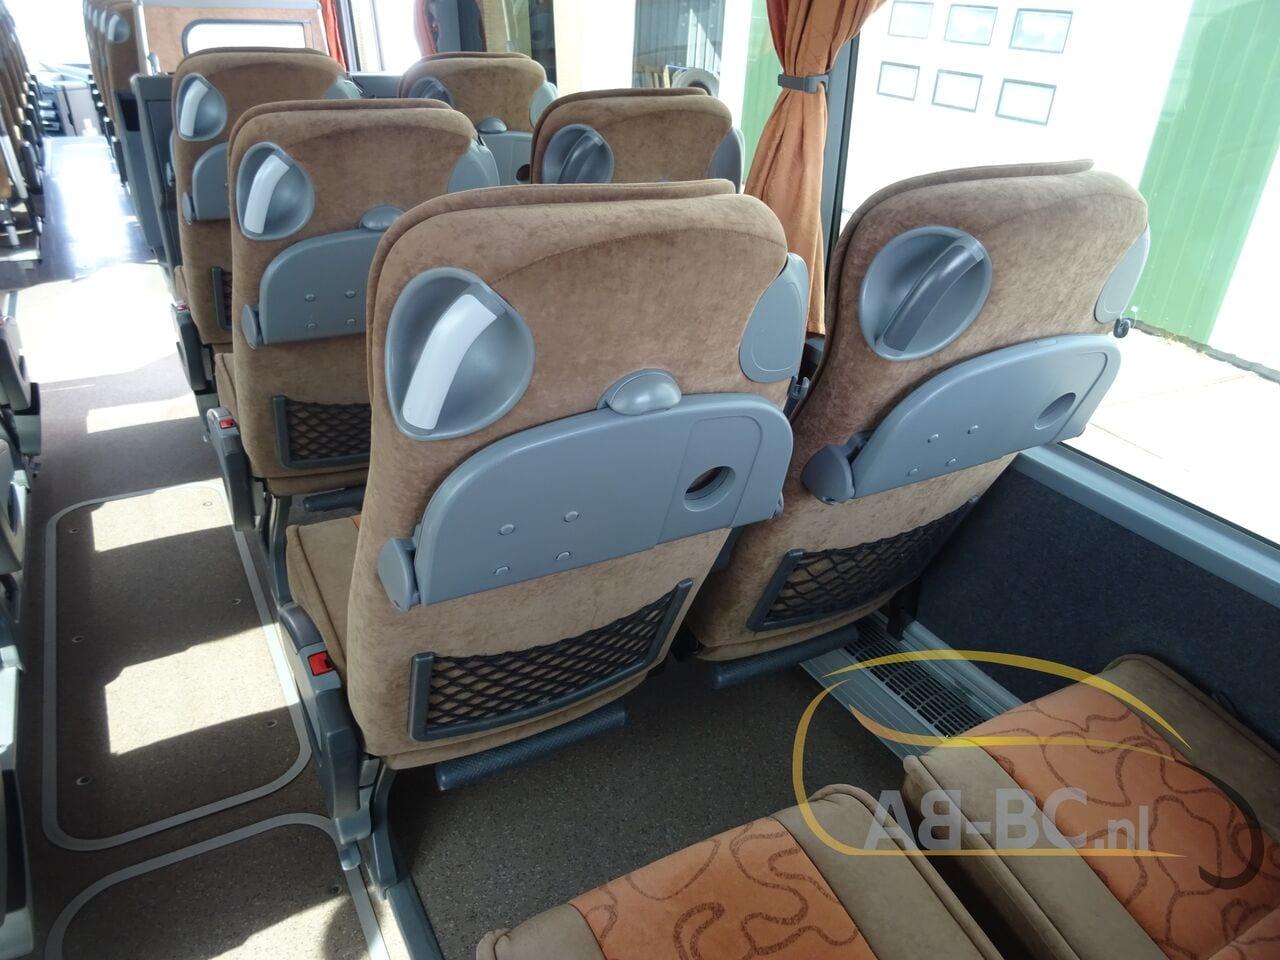 coach-busSETRA-S416H-48-SEATS-LIFTBUS---1620309947254232791_big_6b028d269c371bf5aa0ef398f553b501--21050616581387095000